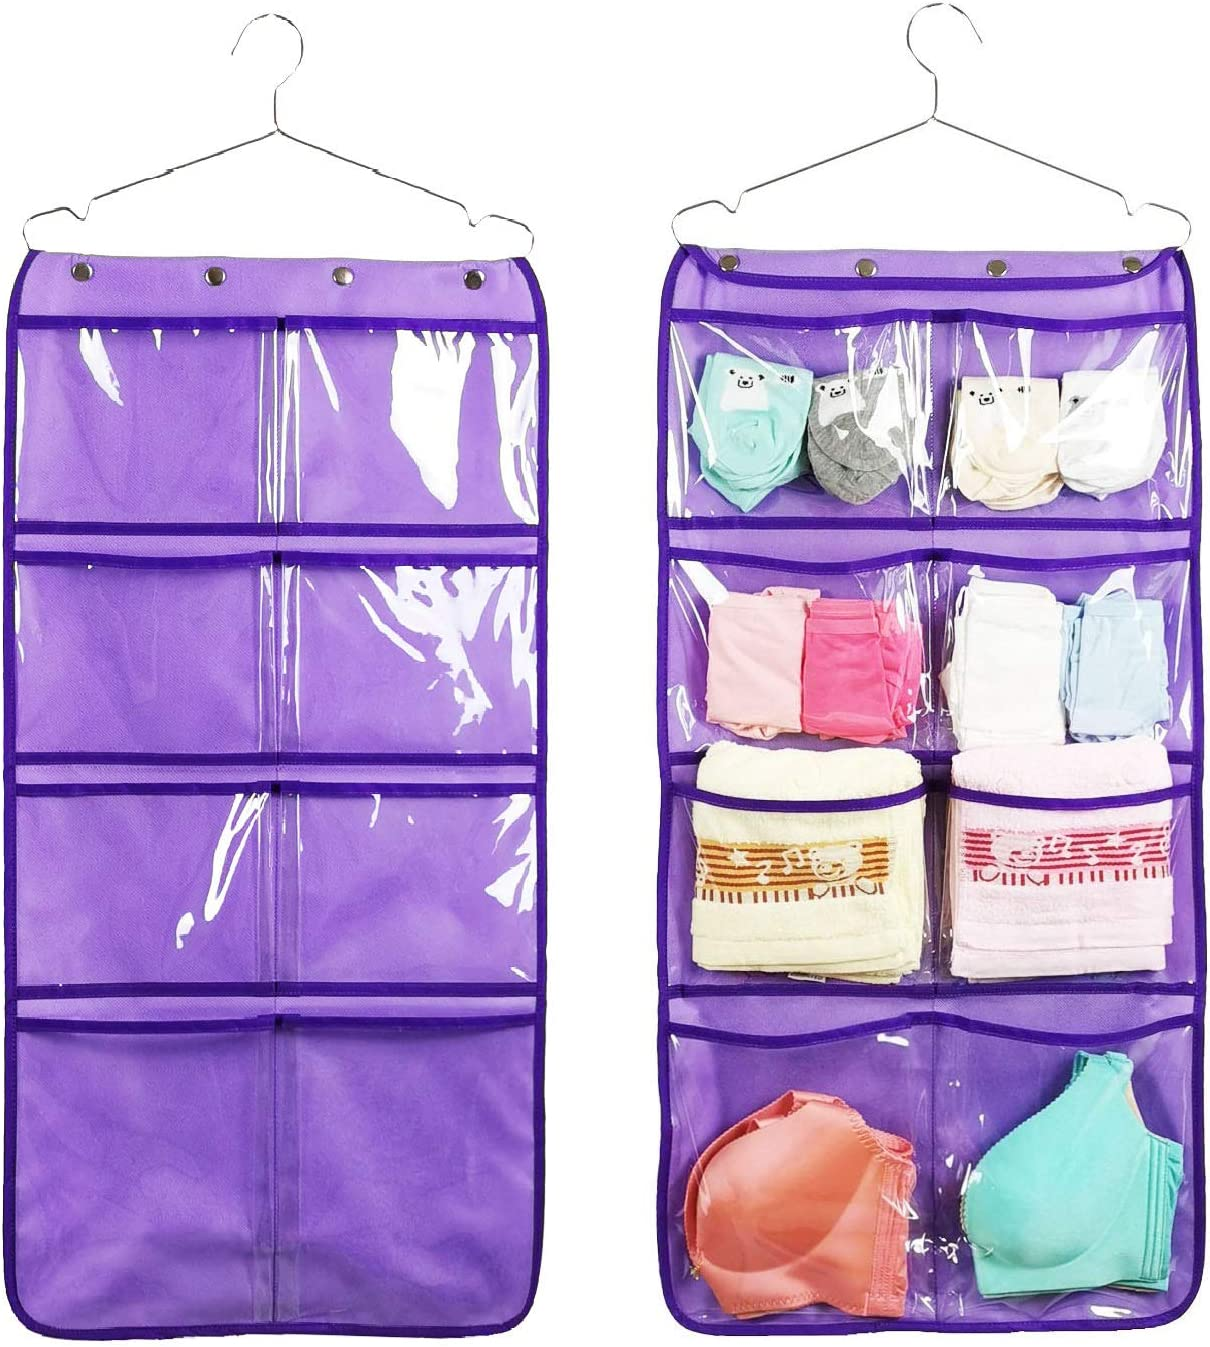 Beige Save Space Hanging Closet WishLotus Hanging Storage Bag Double-sided Reinforced Oxford Cloth 12/&18 30 Compartments Bra Underwear Socks Hanging Storage Organiser for Wall Door Wardrobe